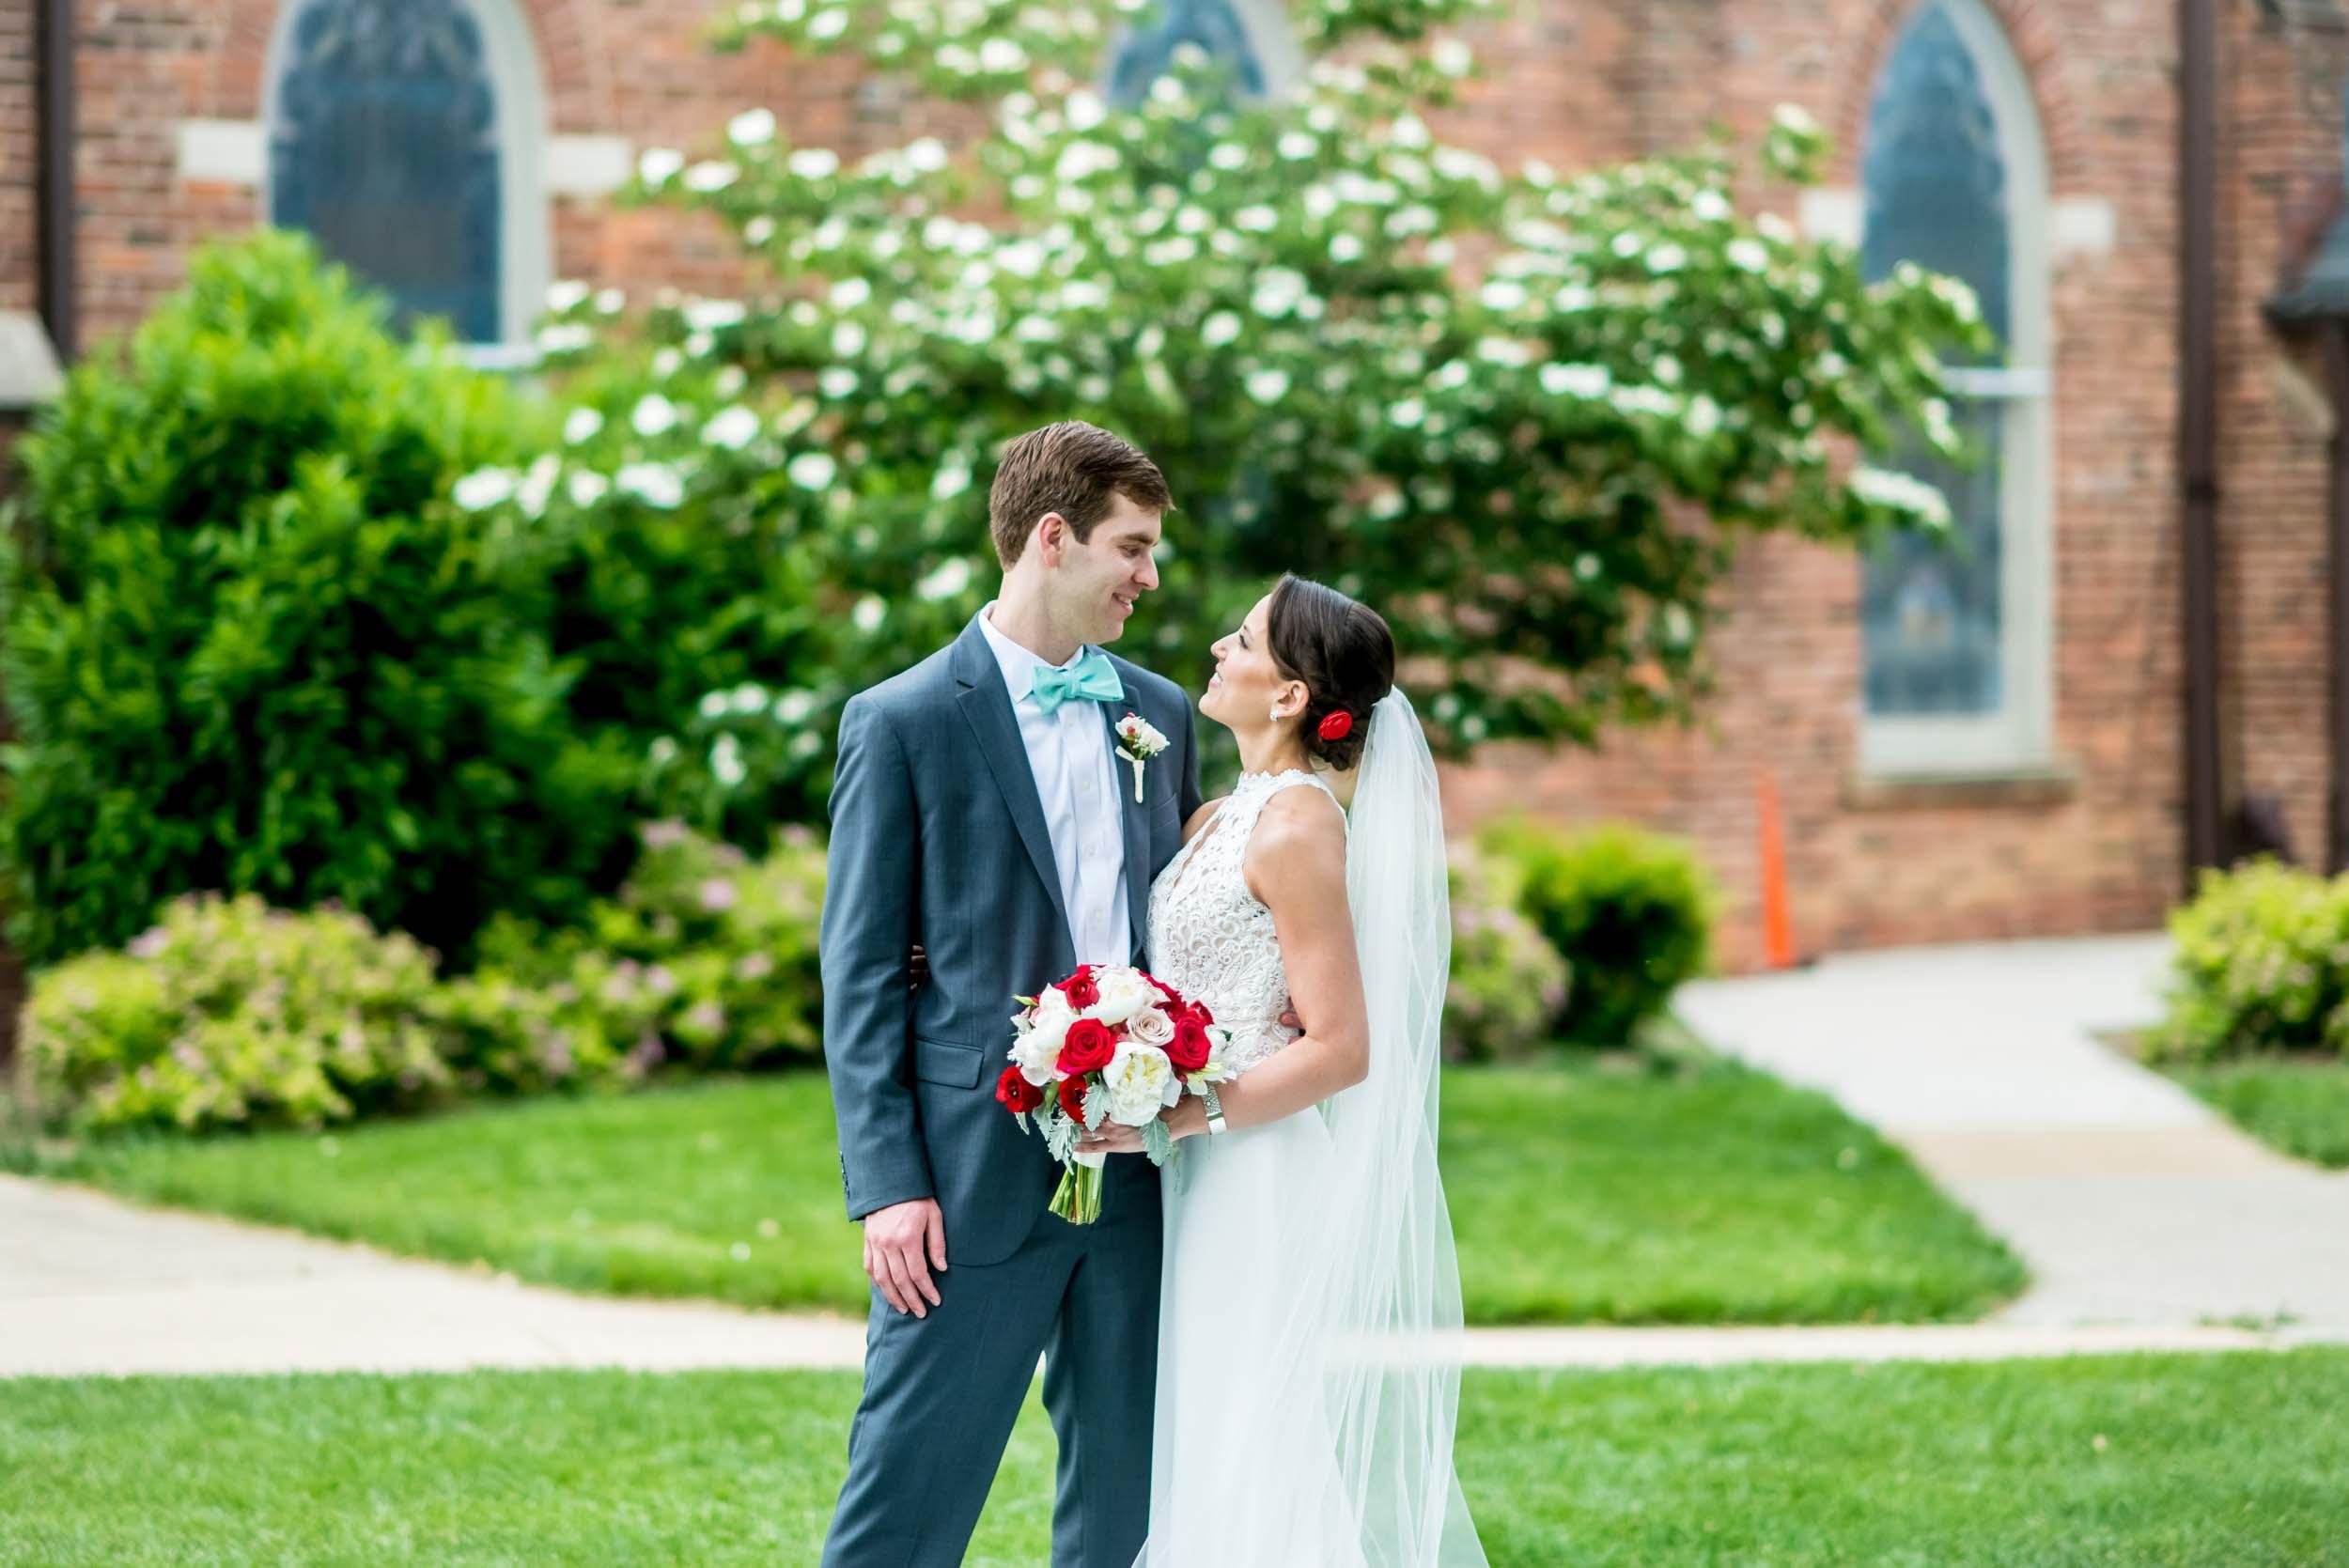 dc+metro+wedding+photographer+vadym+guliuk+photography+wedding+bride+and+groom-2050.jpg